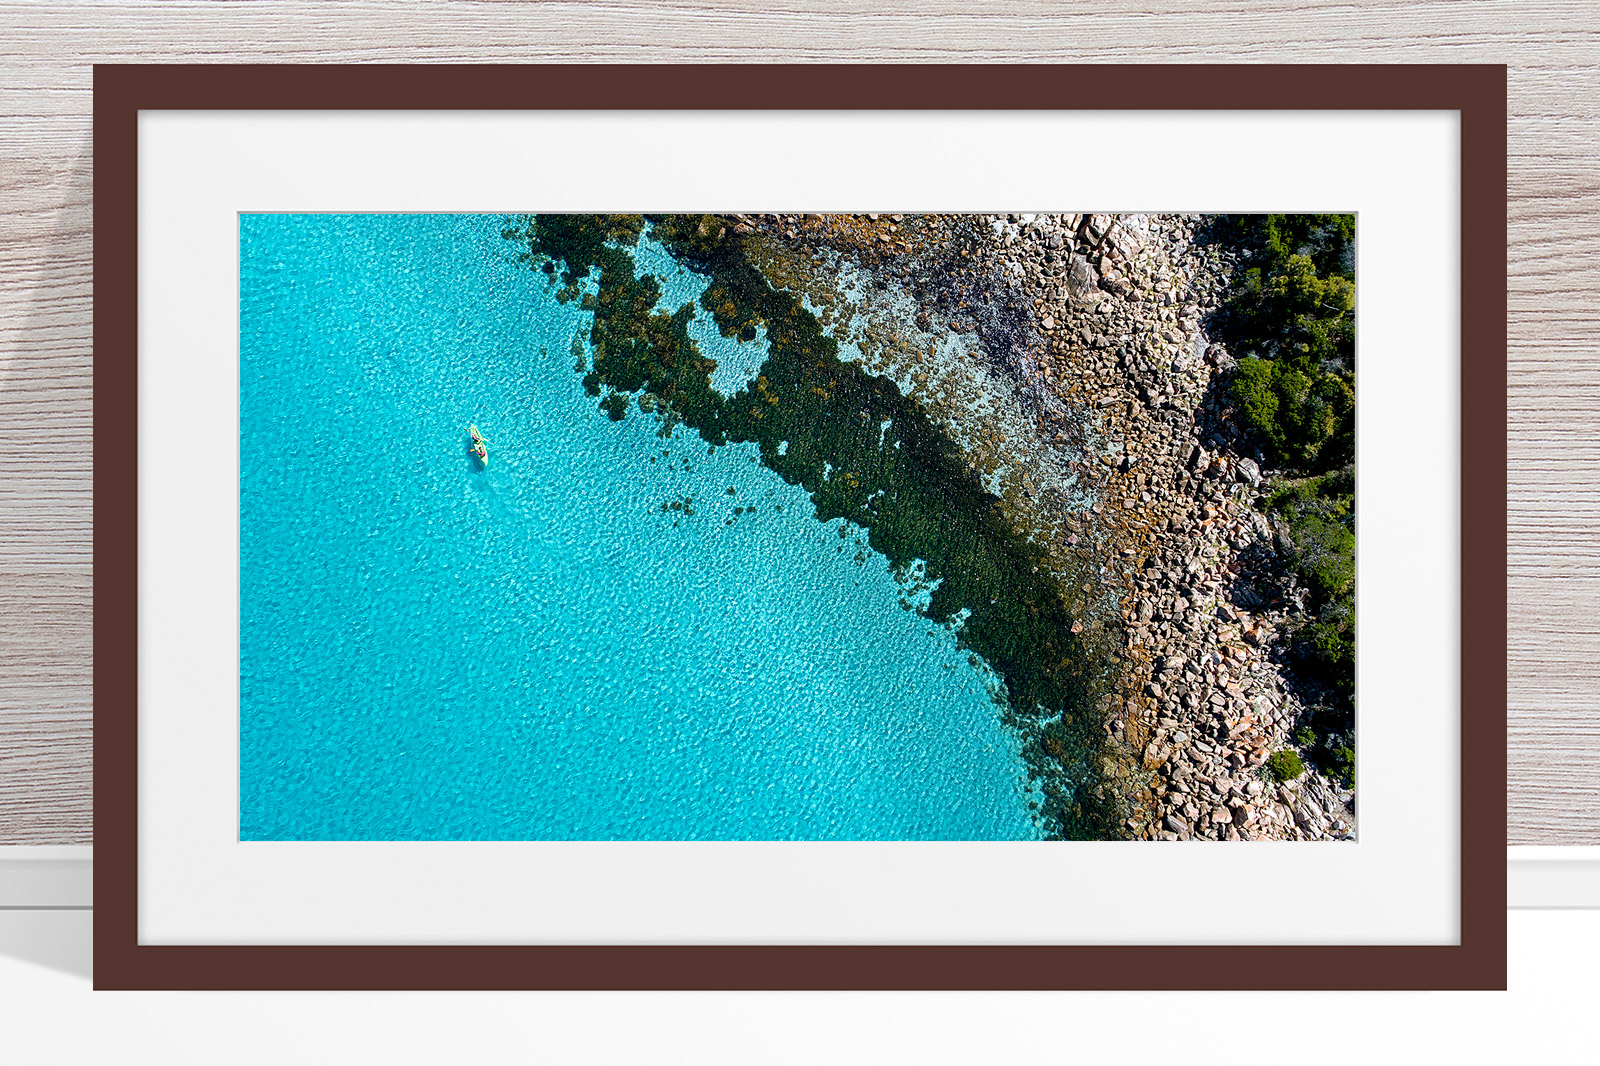 025 - Jason Mazur - 'Kayaker, Geographe Bay, Dunsborough' Dark Frame